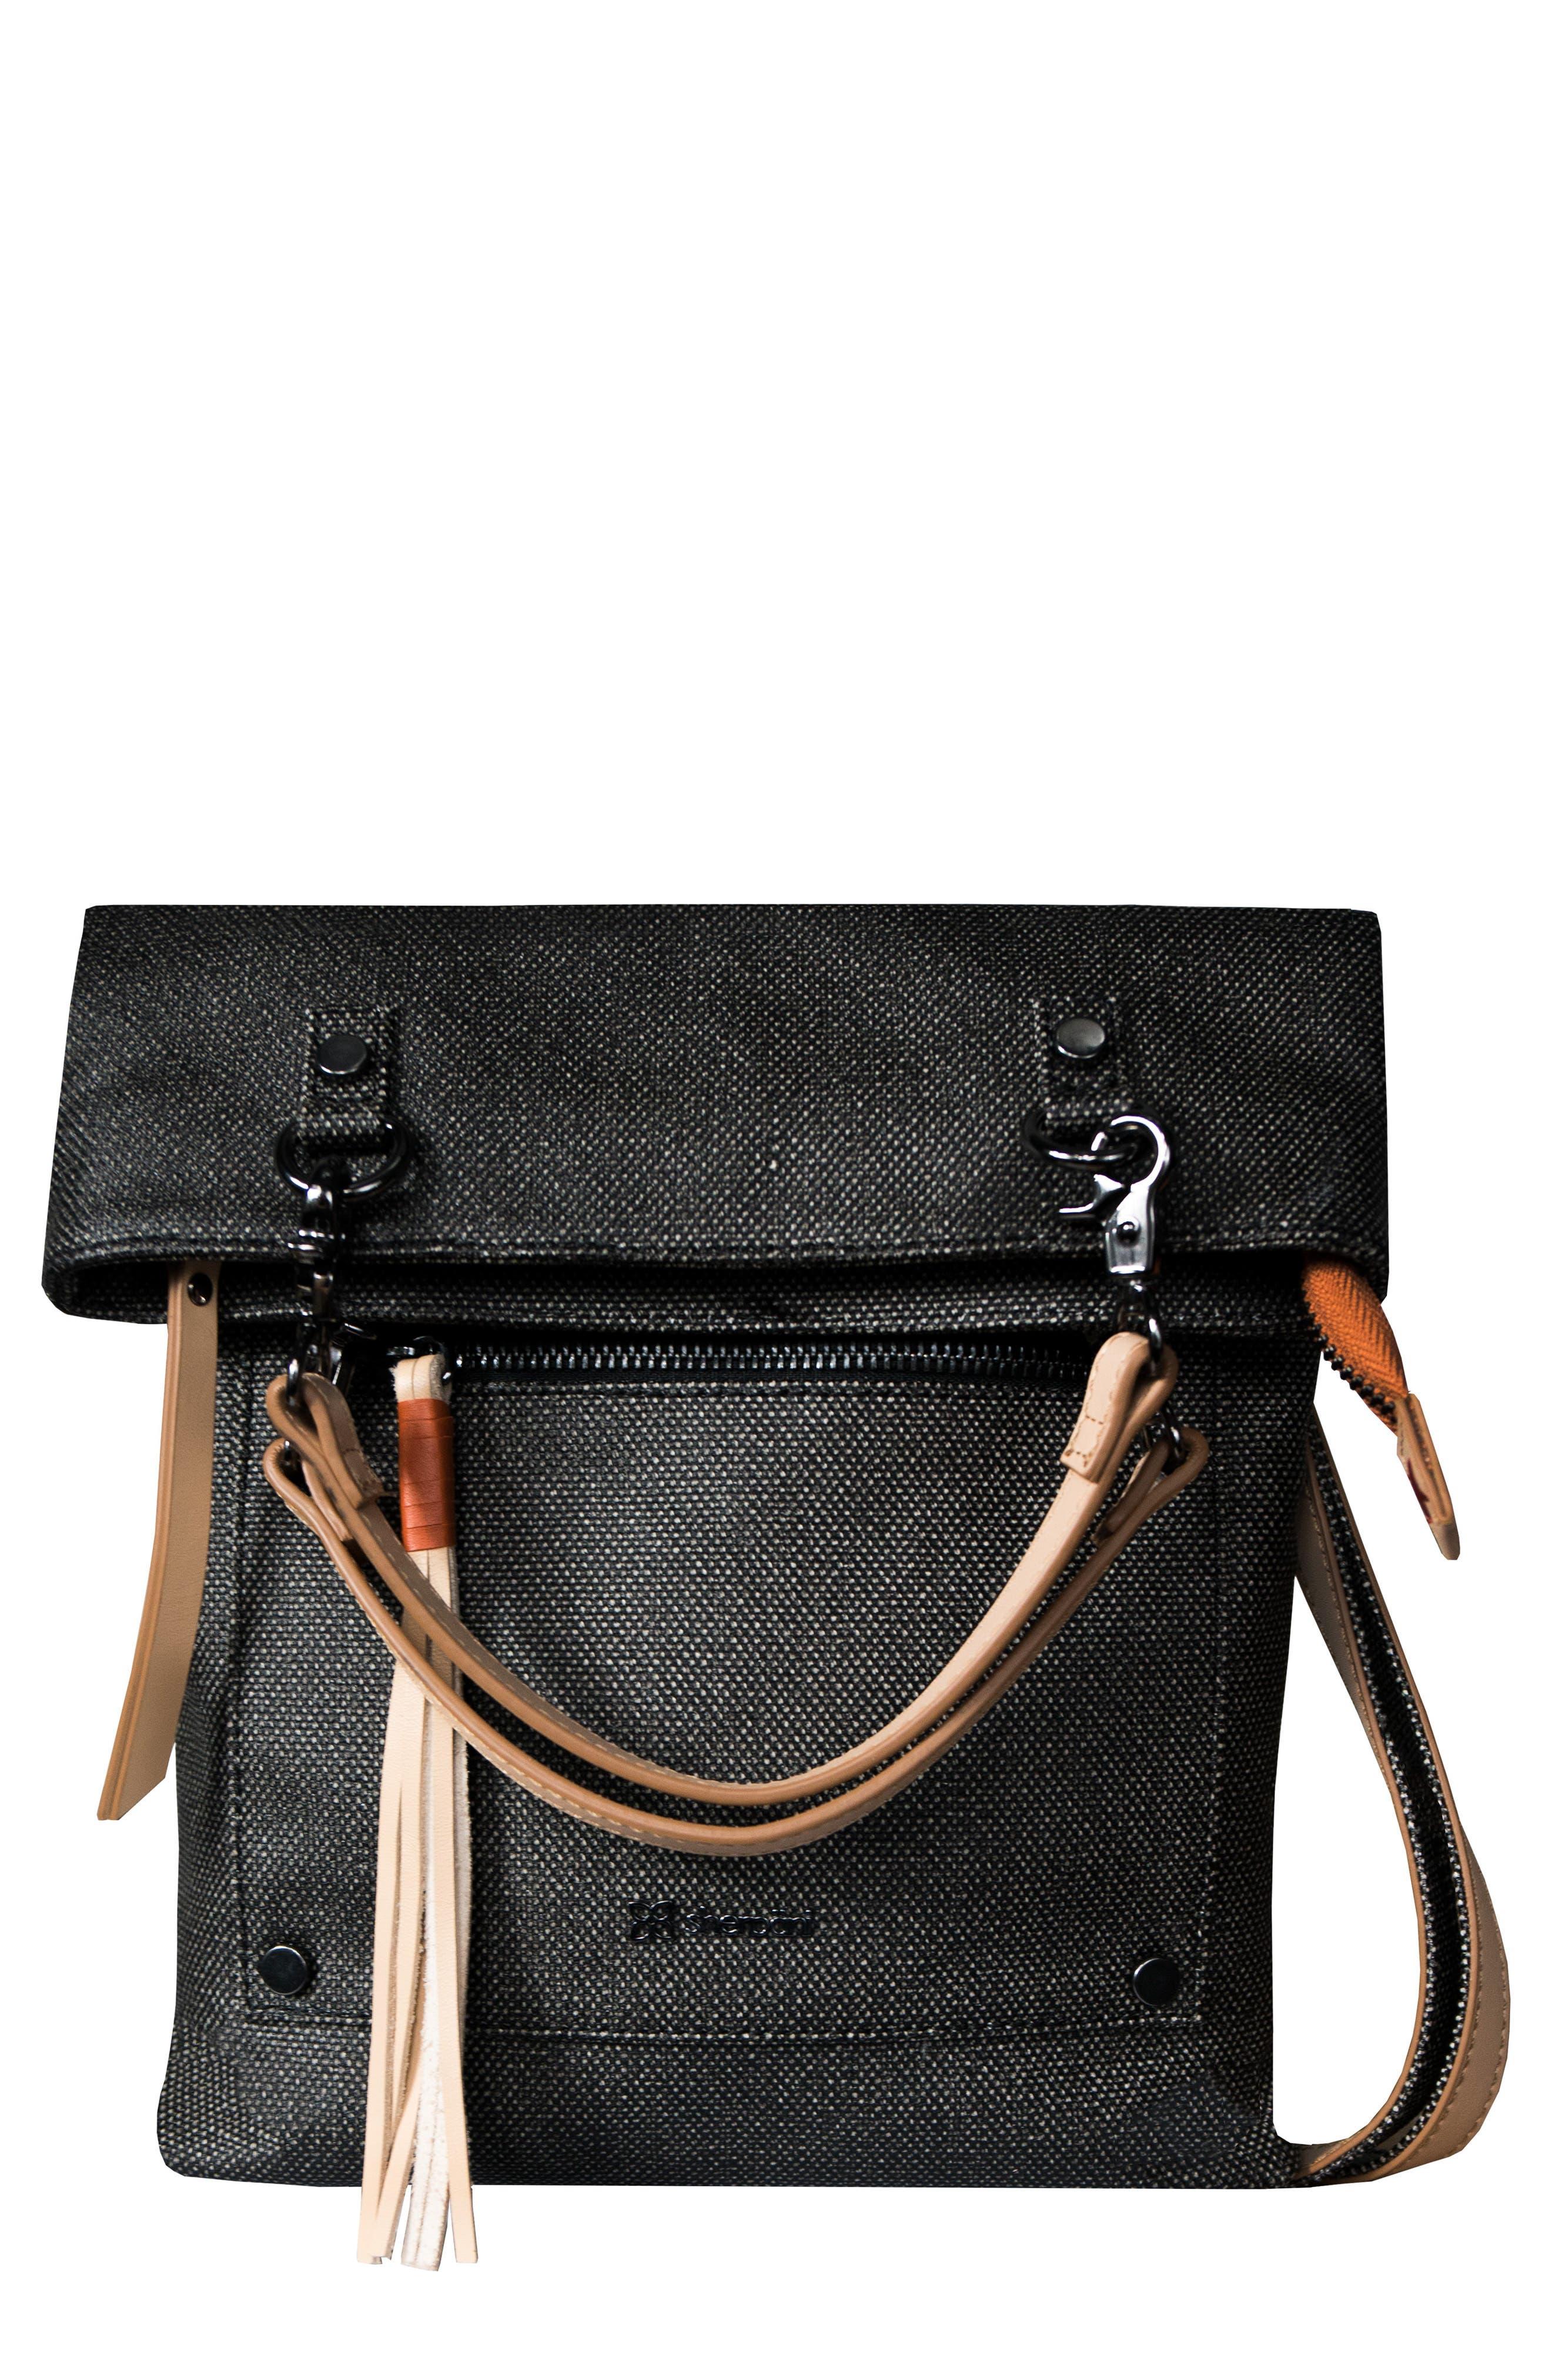 Rebel Coated Canvas Crossbody Bag,                             Main thumbnail 1, color,                             Blackstone